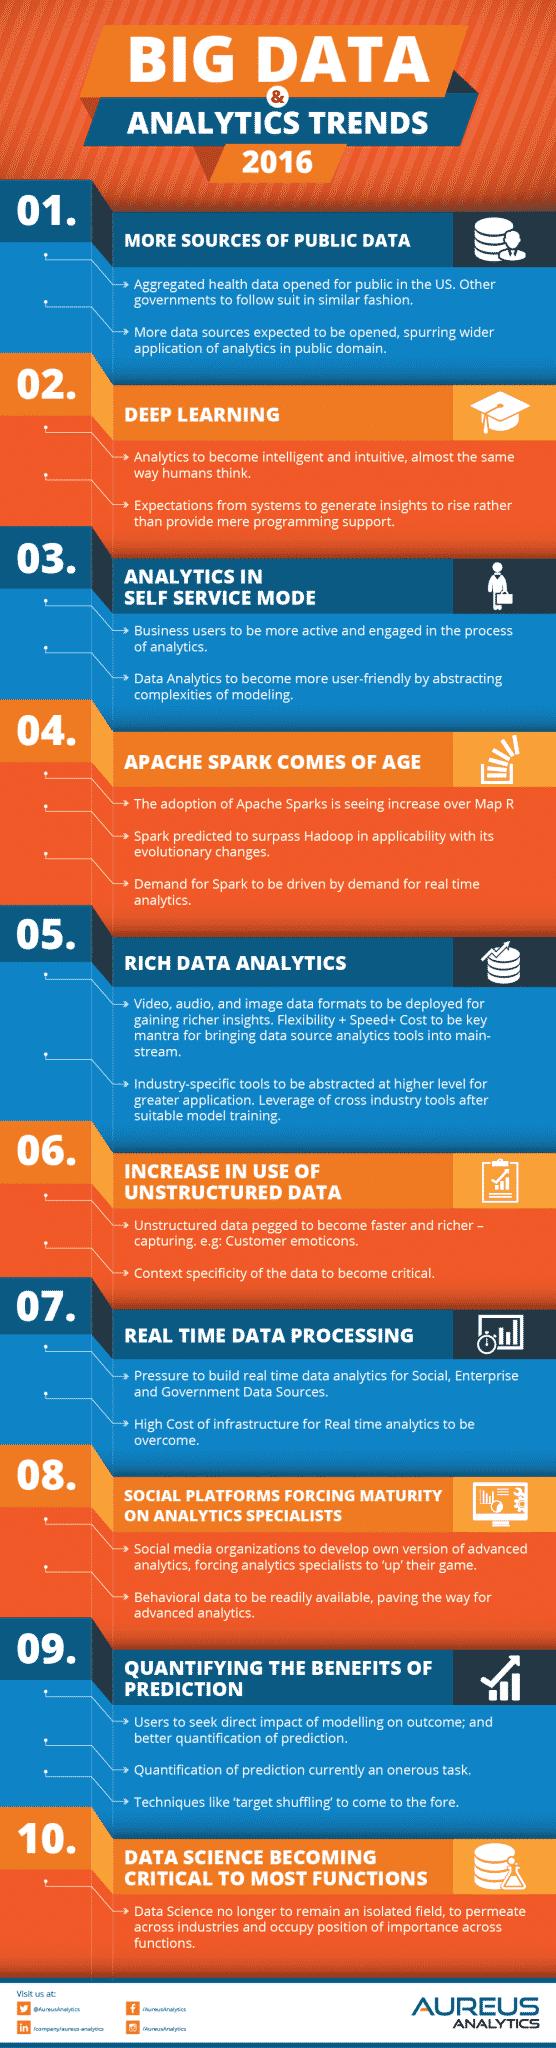 big-data-analytics-trends-report-aureus-analytics